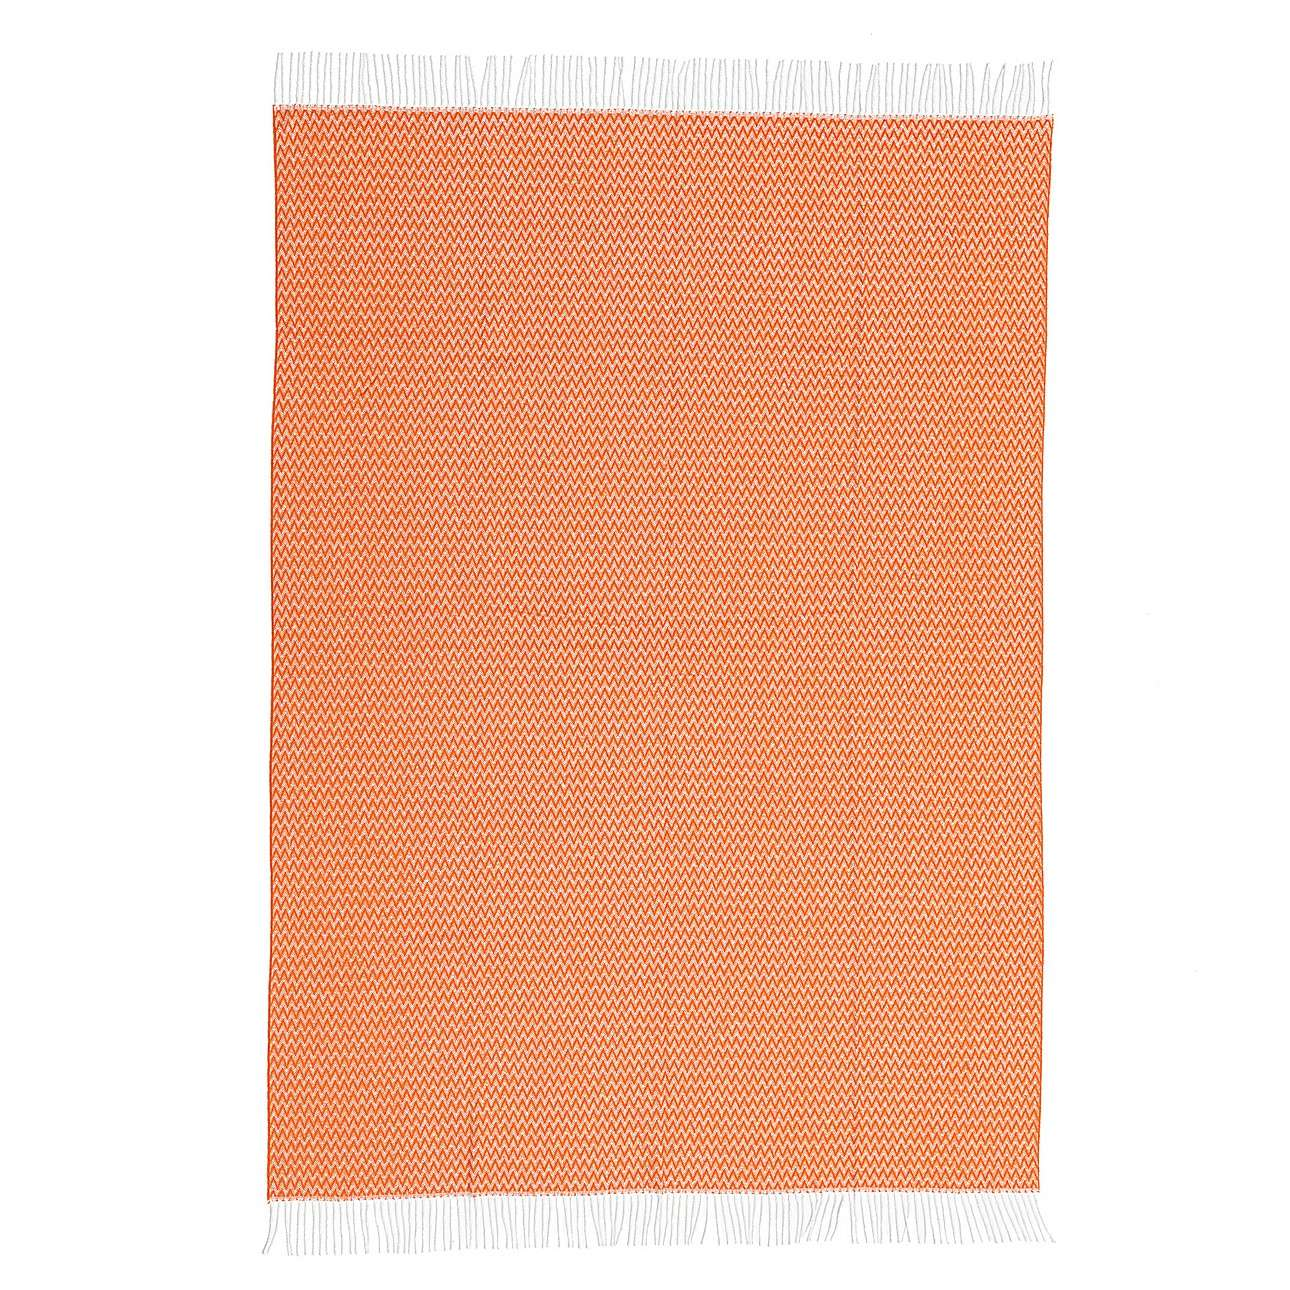 Pléd Ibiza 140x200cm orange chevron